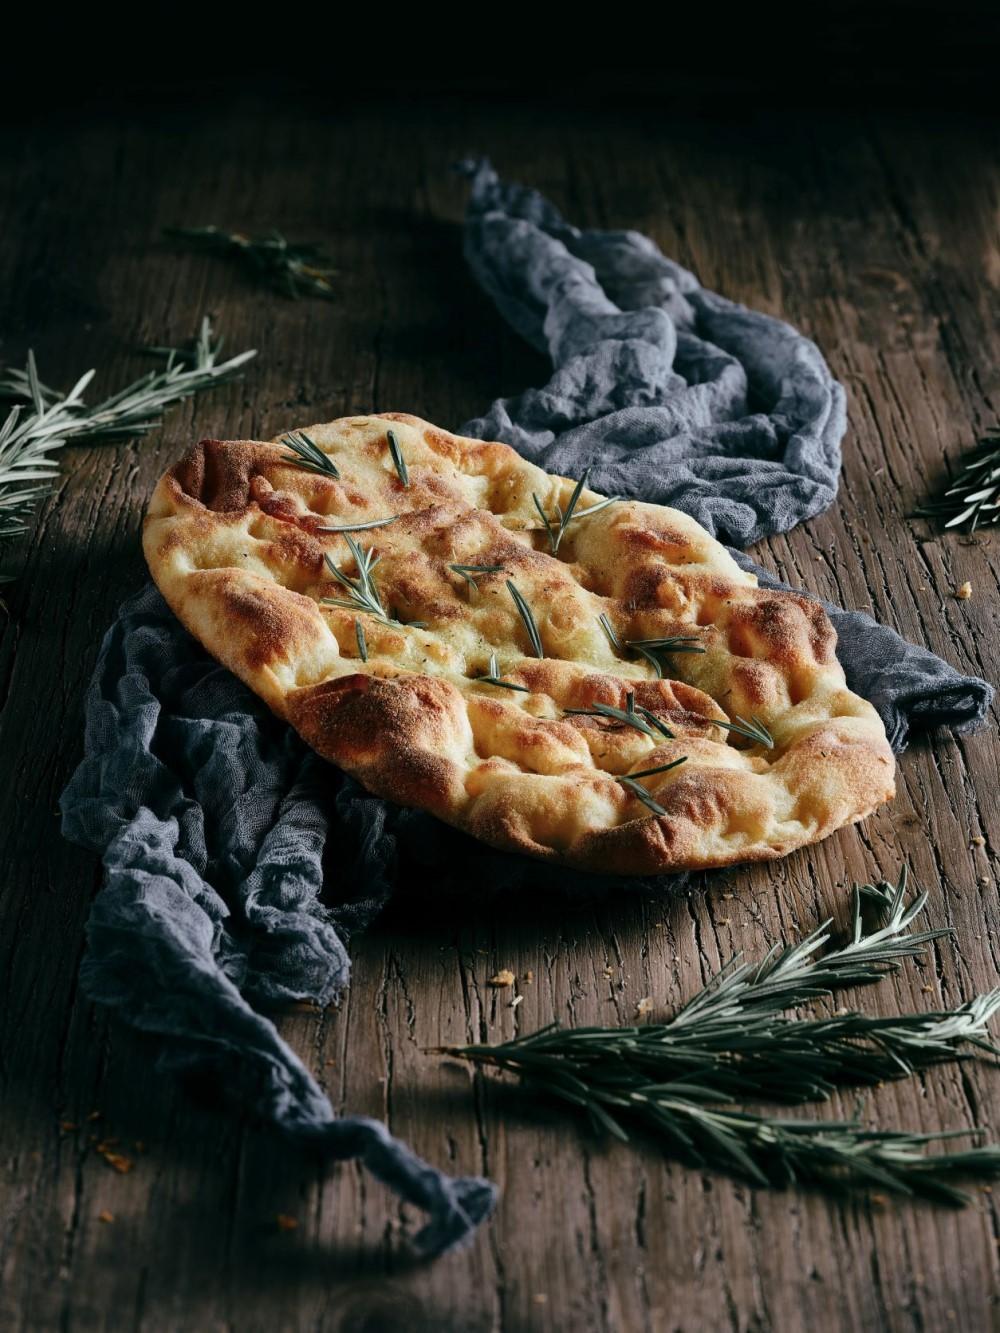 Pinsami Dispensa Gourmet arriva sul mercato